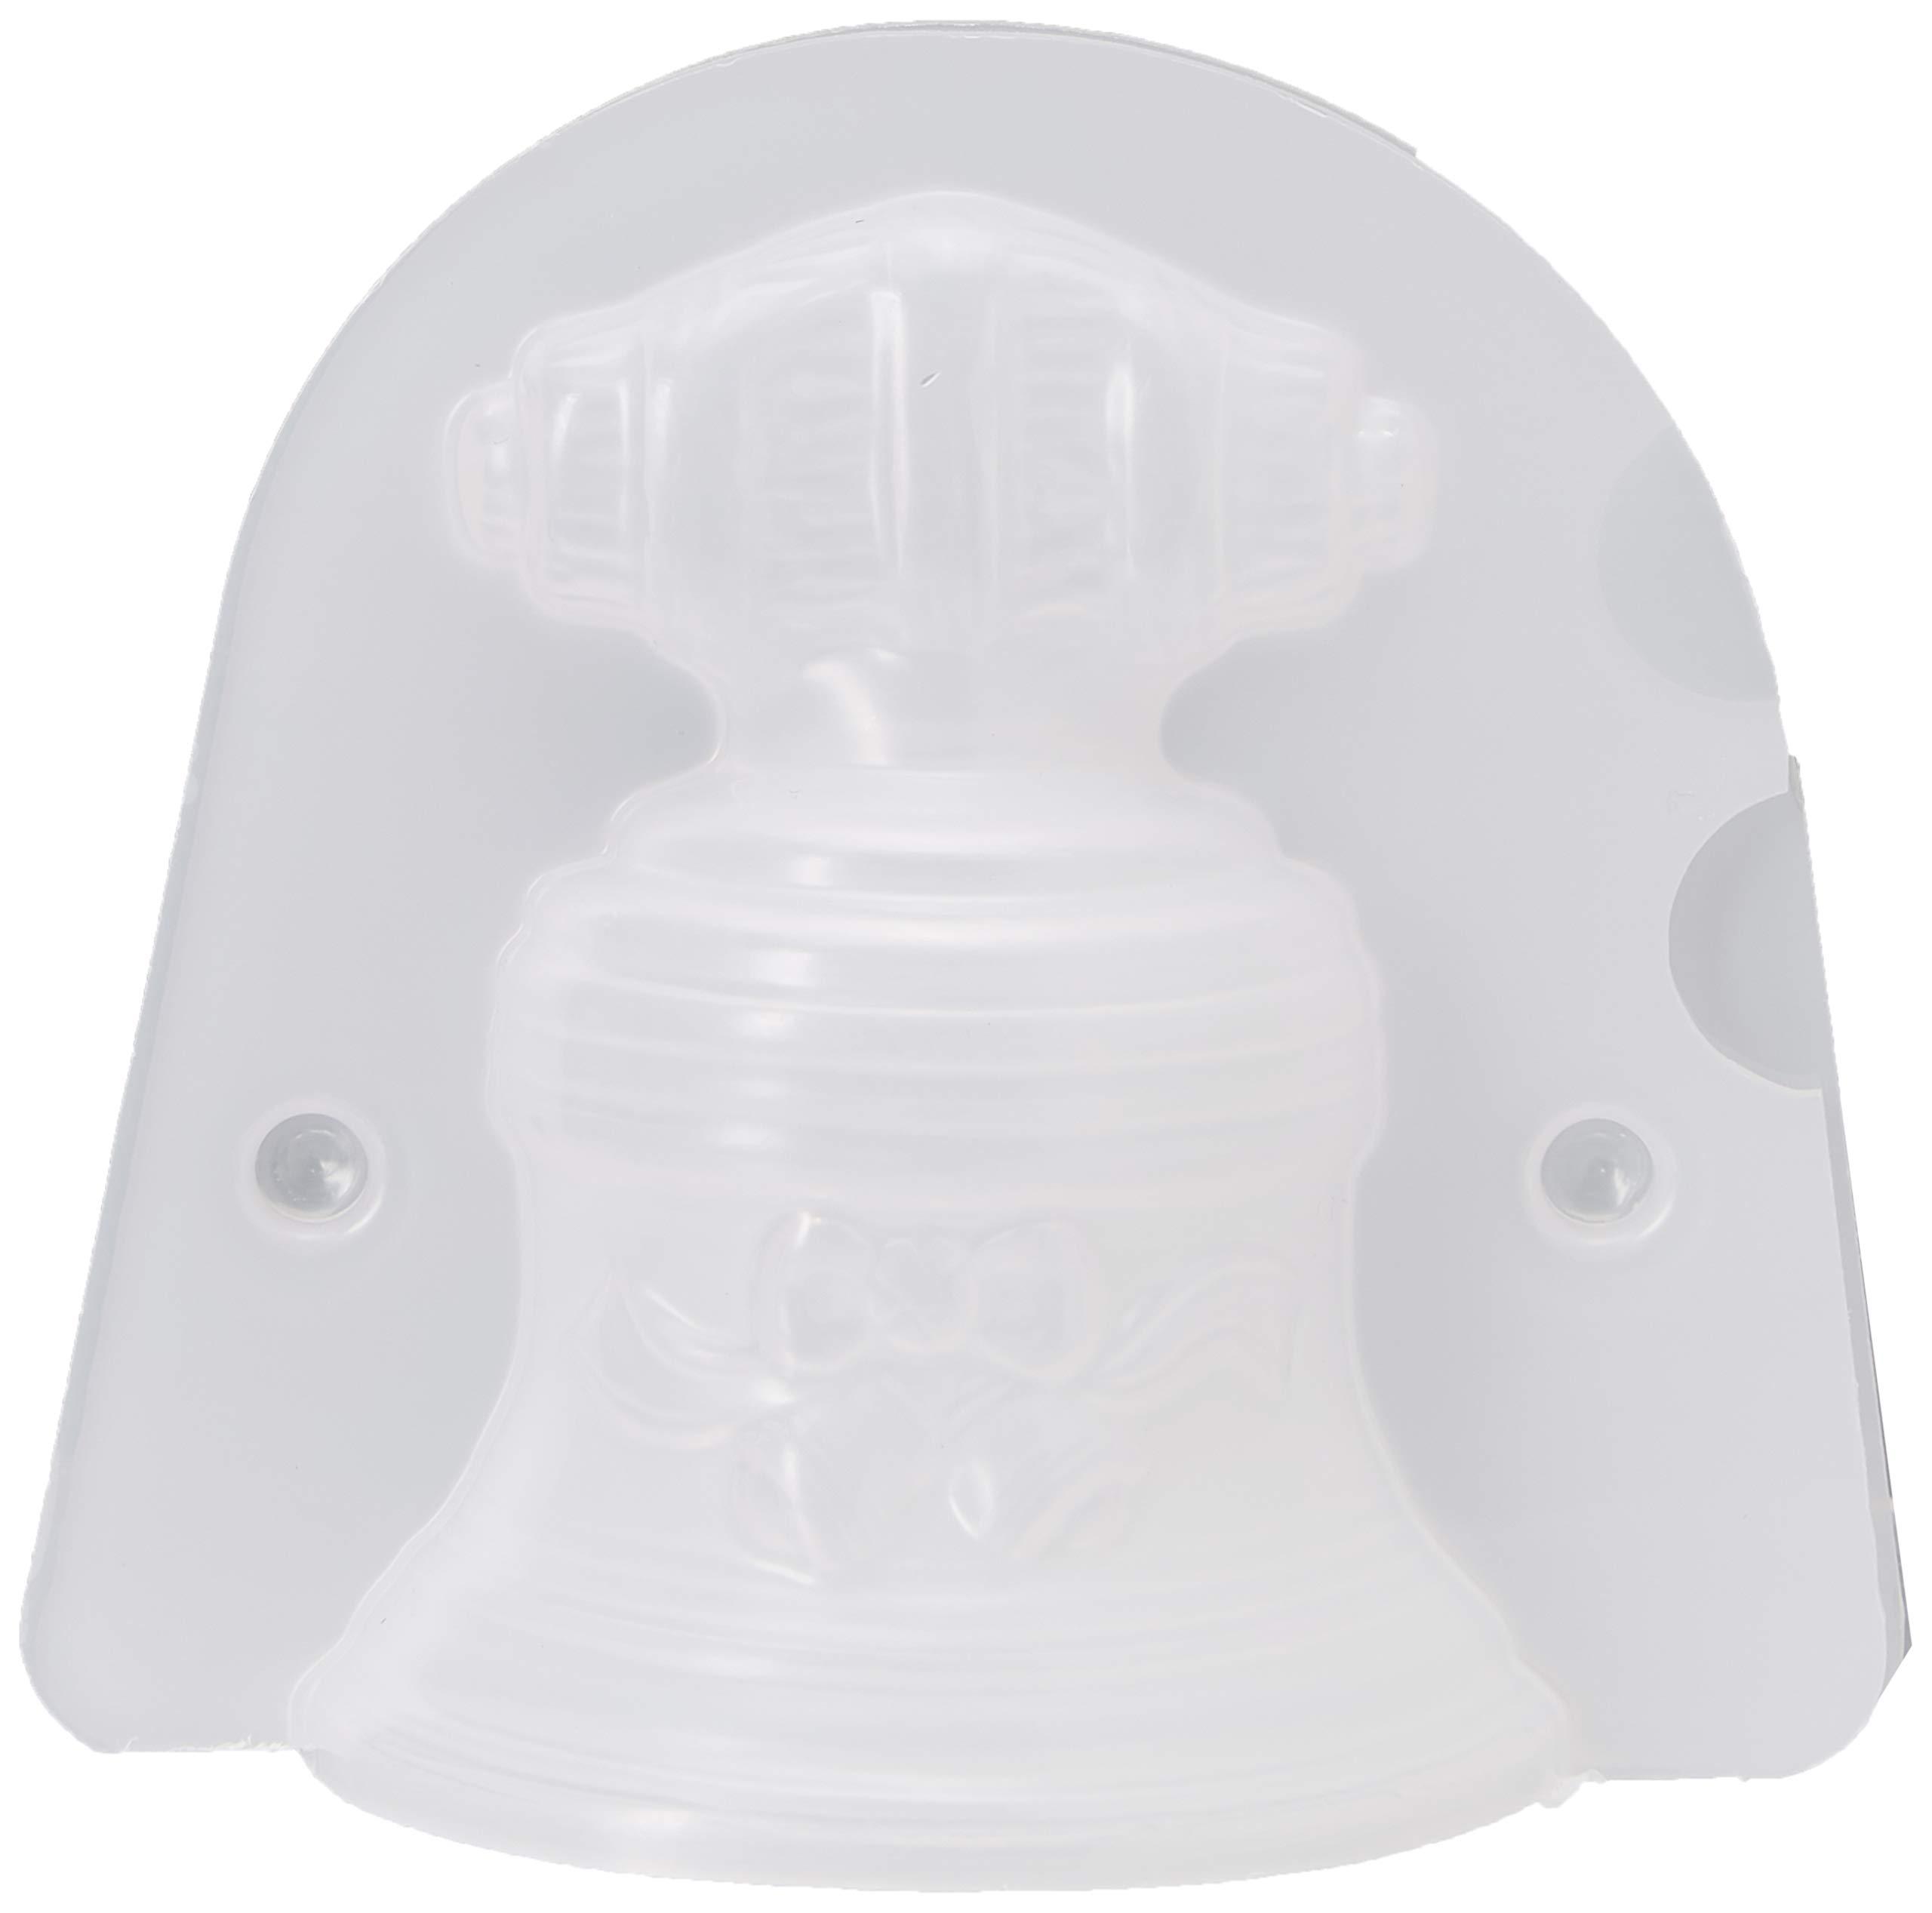 Martellato MAC950S 1 Figure Bell Mould, 110 mm, Plastic, Transparent